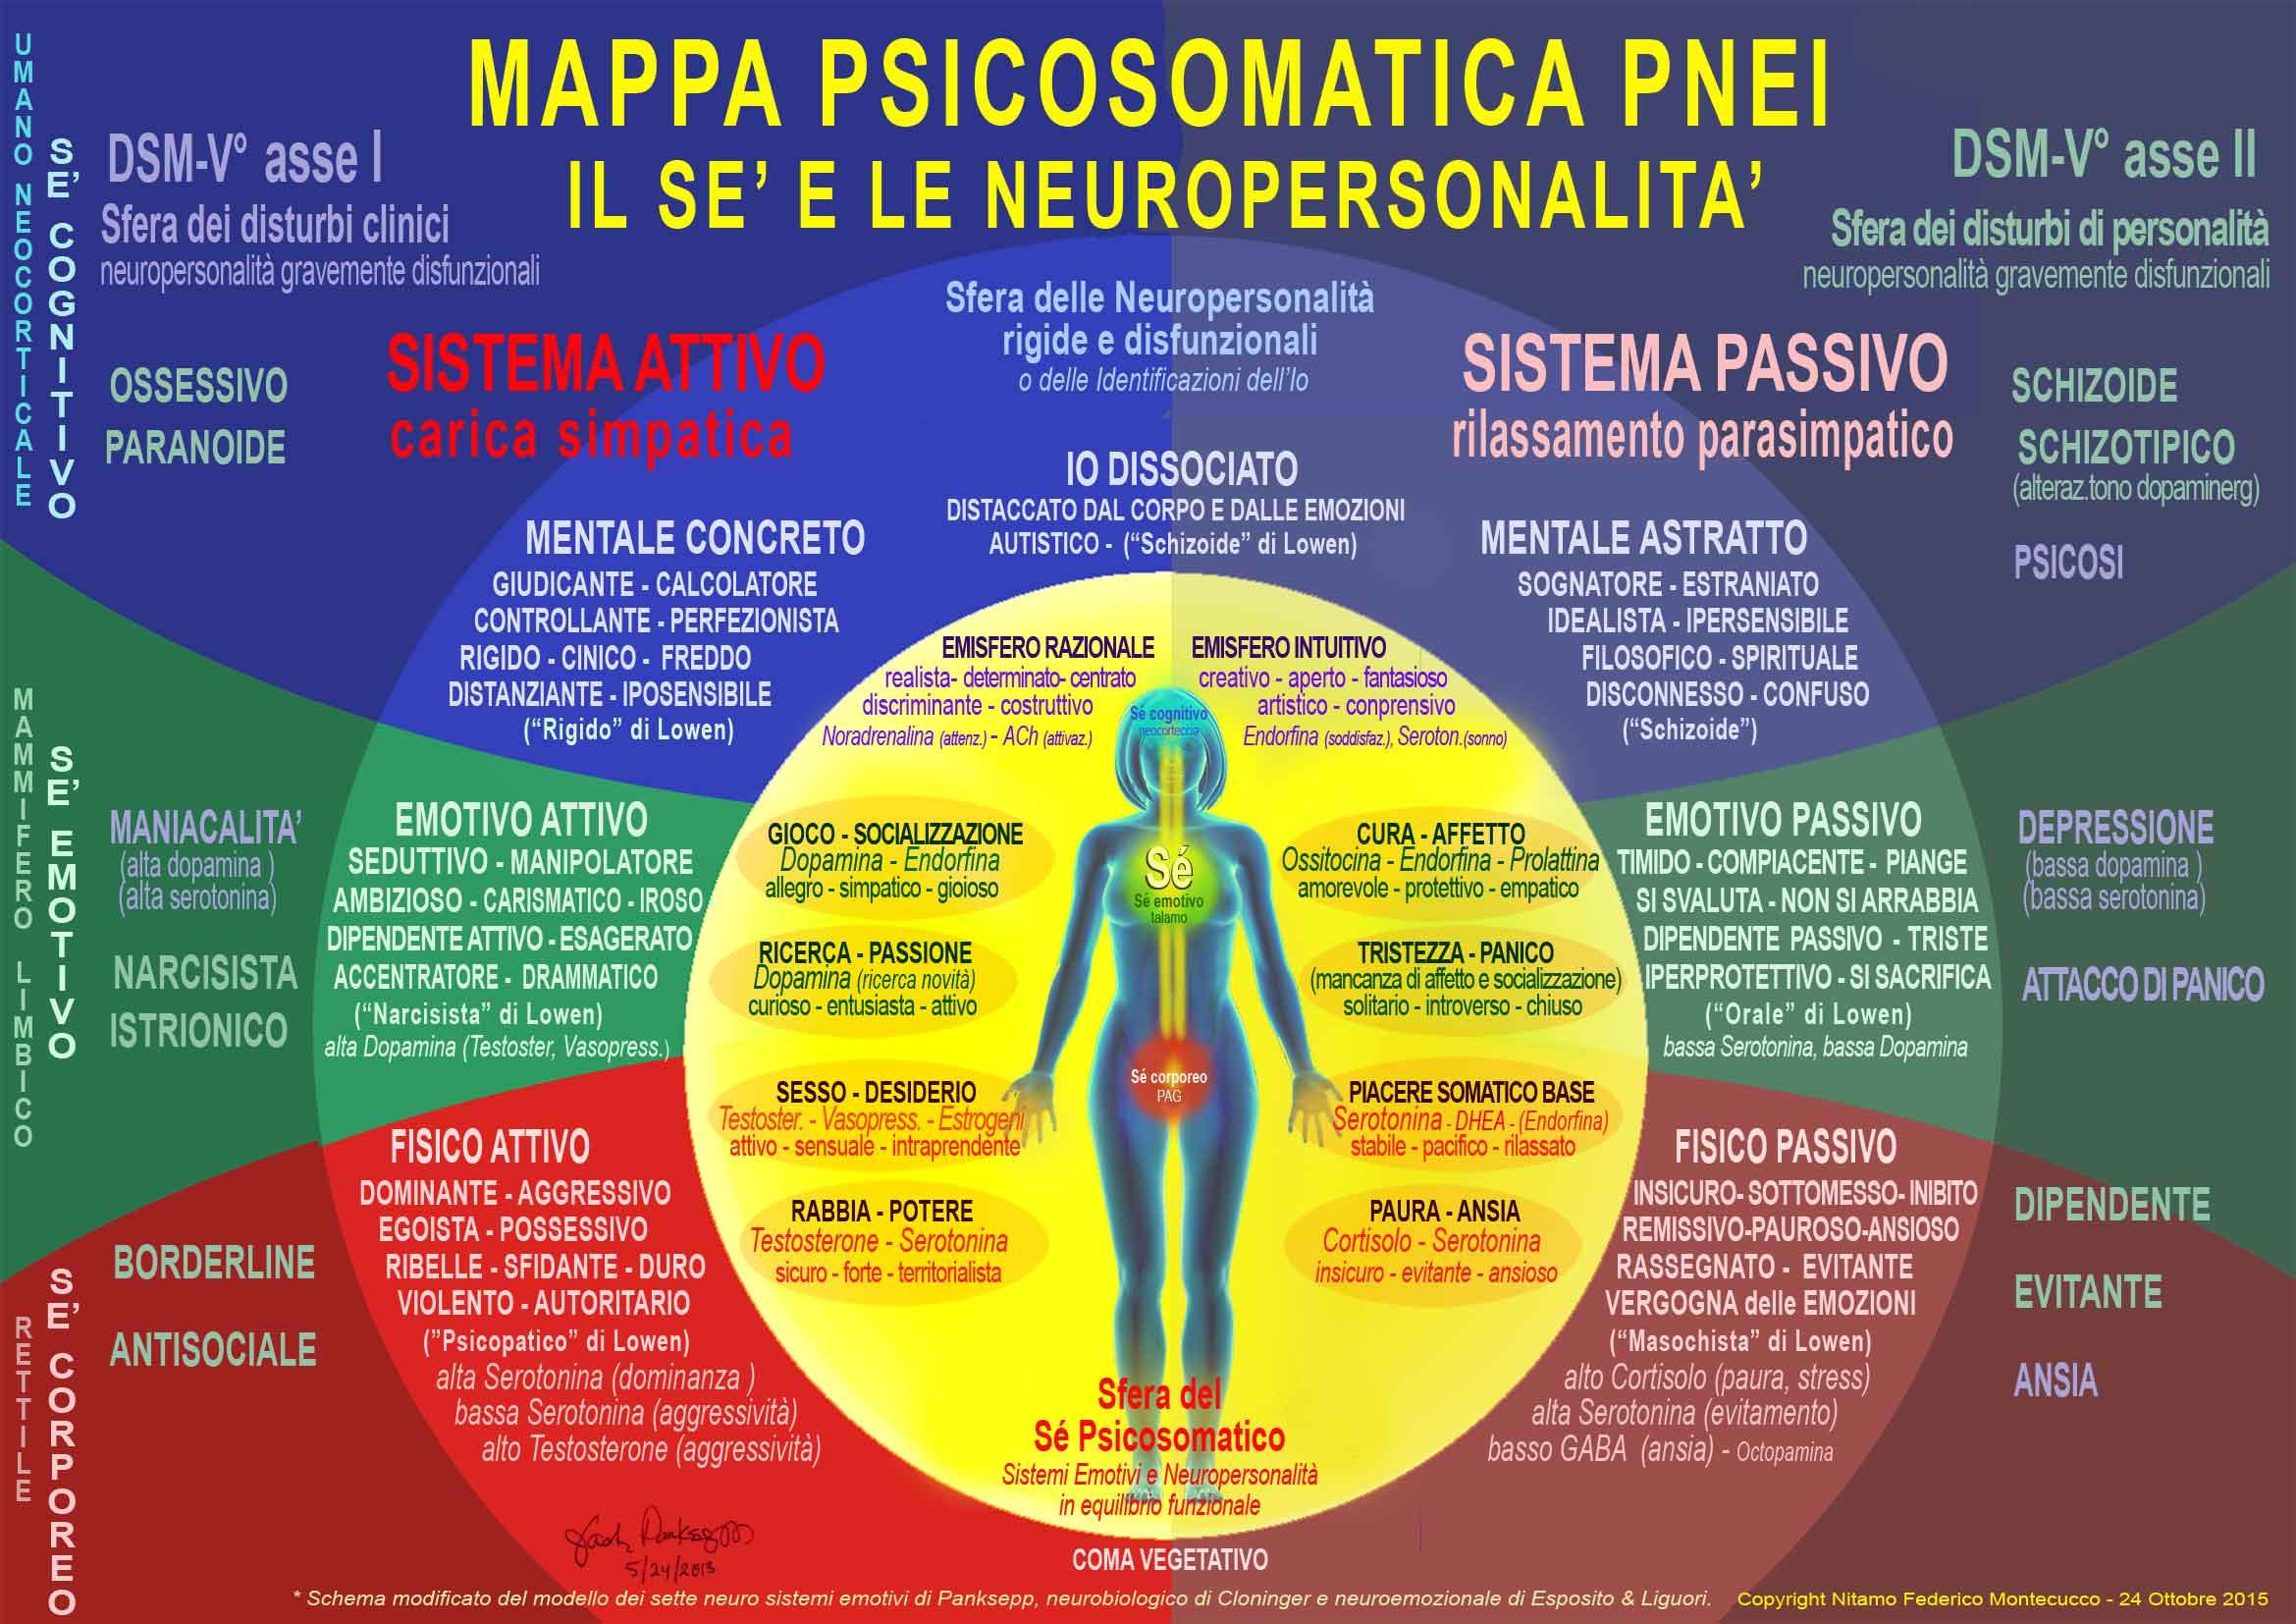 mappa neuropersonalità